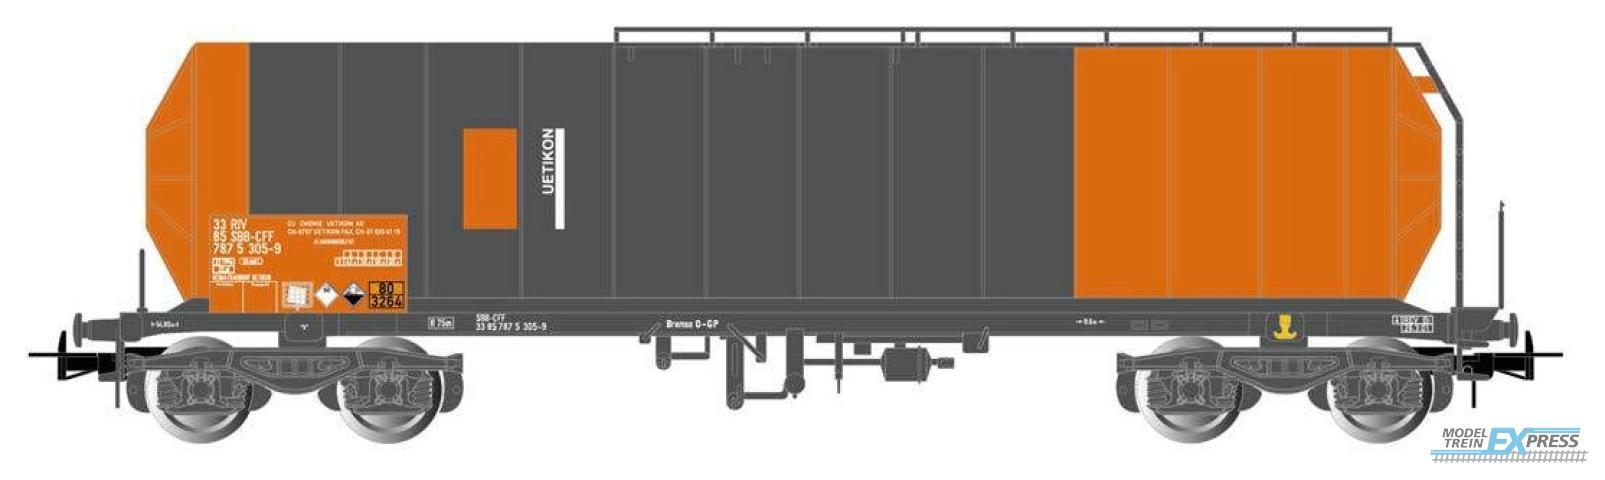 Rivarossi 6421